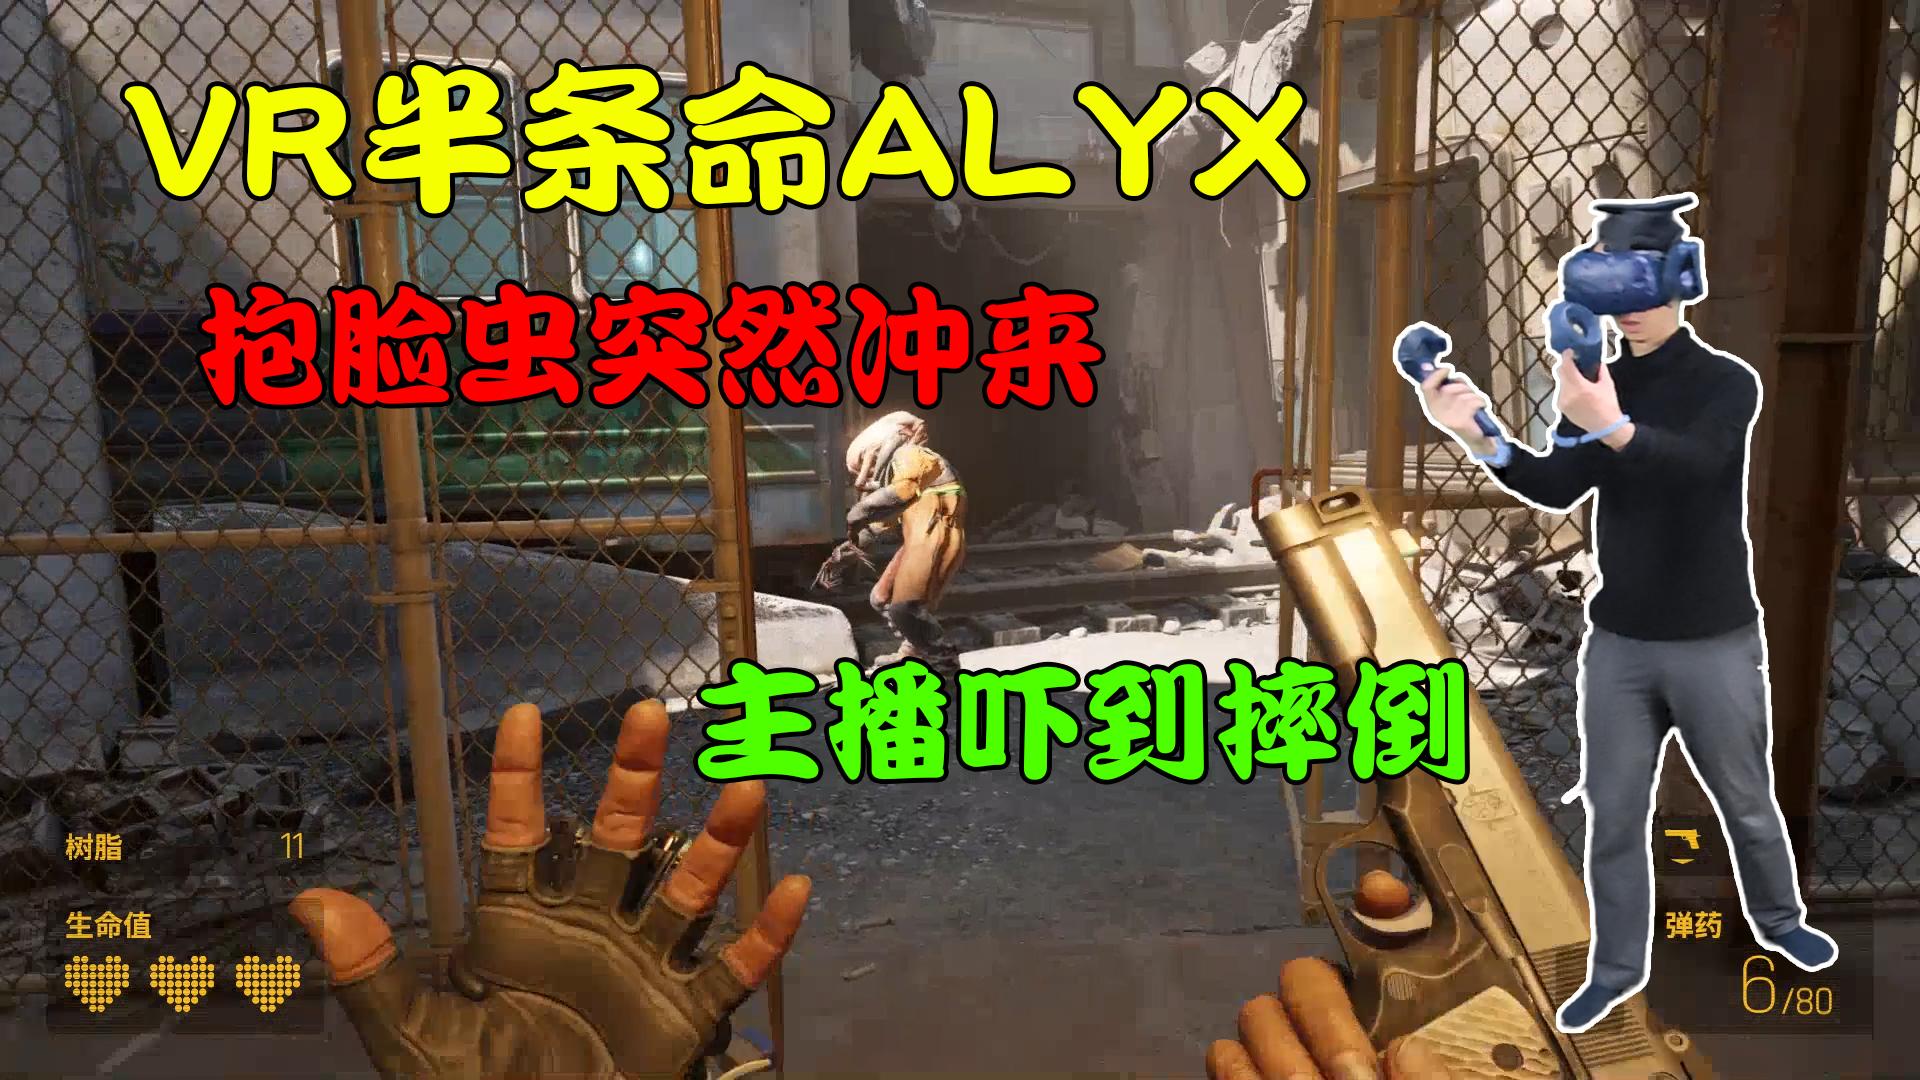 VR半条命alyx:抱脸虫突然扑上来,吓的主播连摔跟头